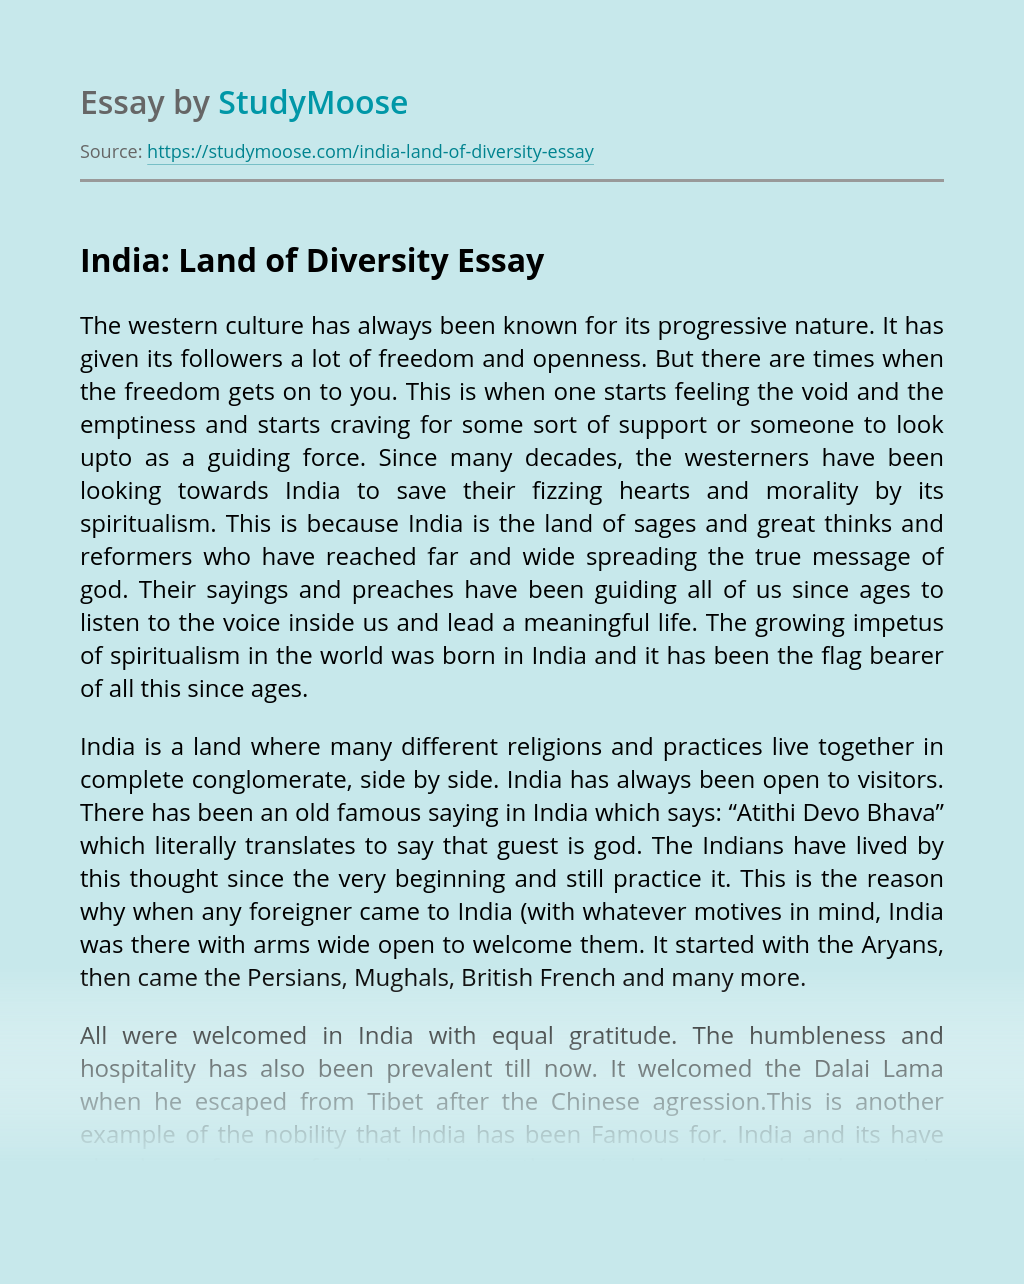 India: Land of Diversity